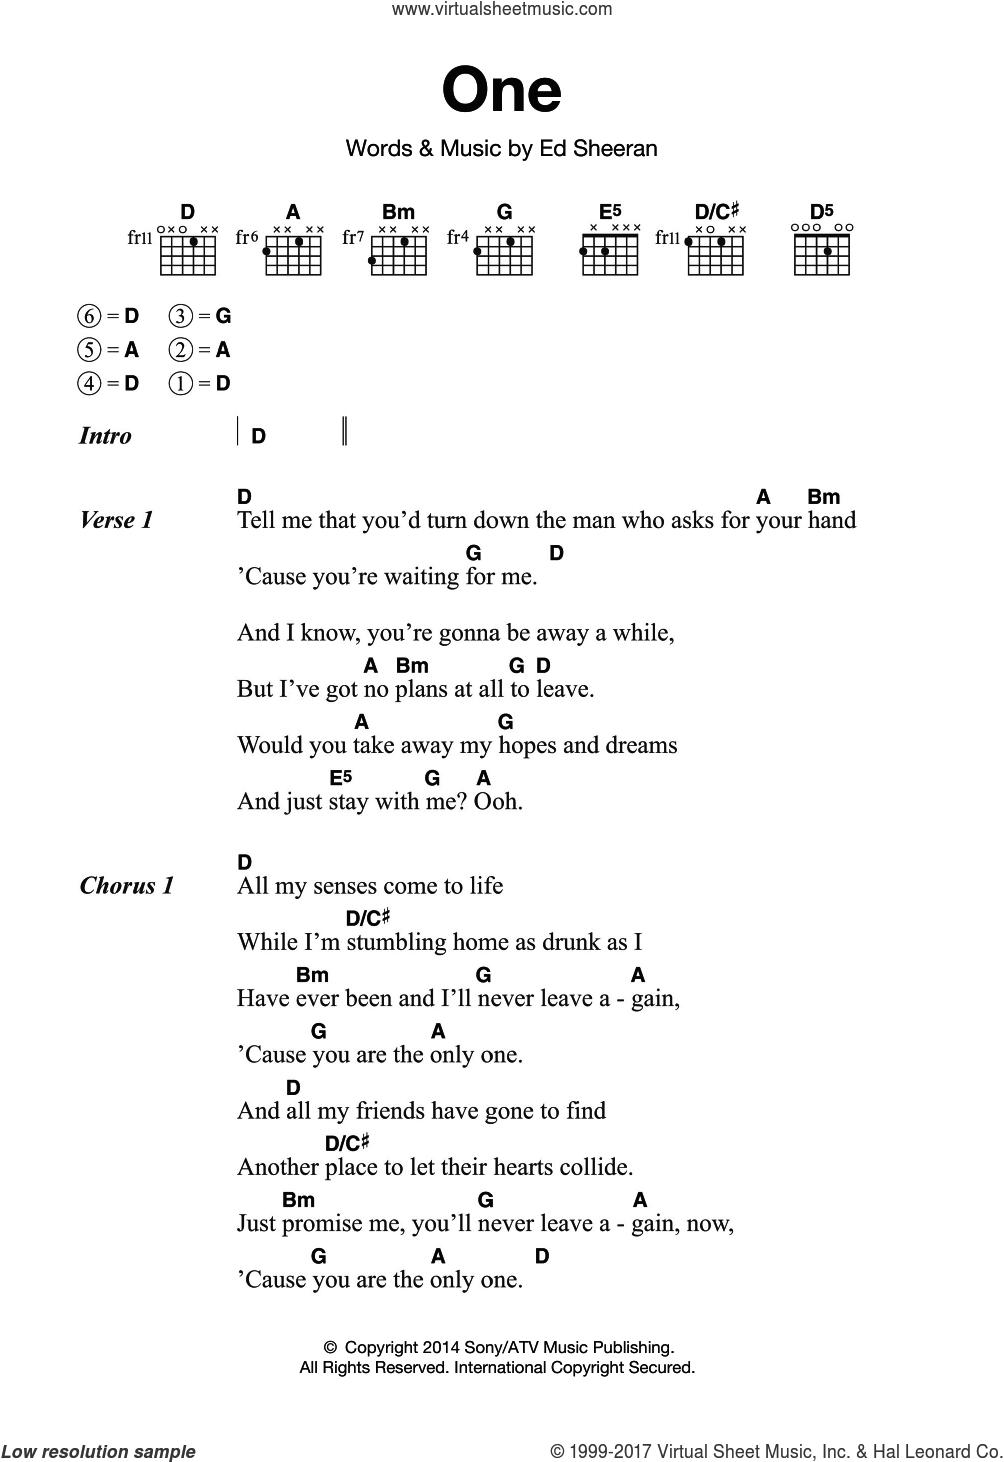 Sheeran   One sheet music for guitar chords [PDF] v15